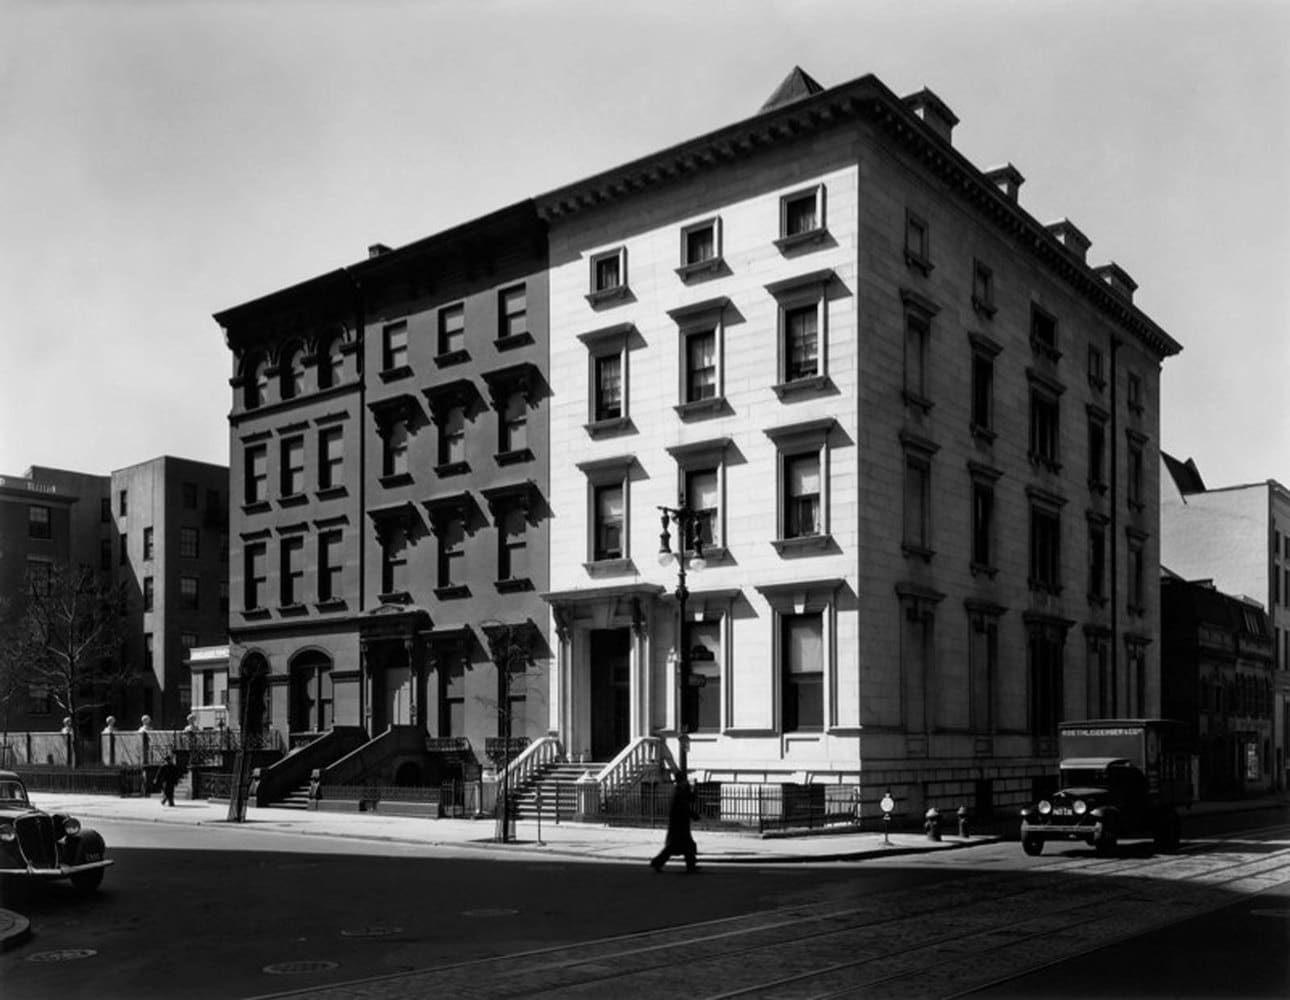 Berenice Abbott, Fifth Avenue Houses, No. 4, 6, 8, New York, 1936